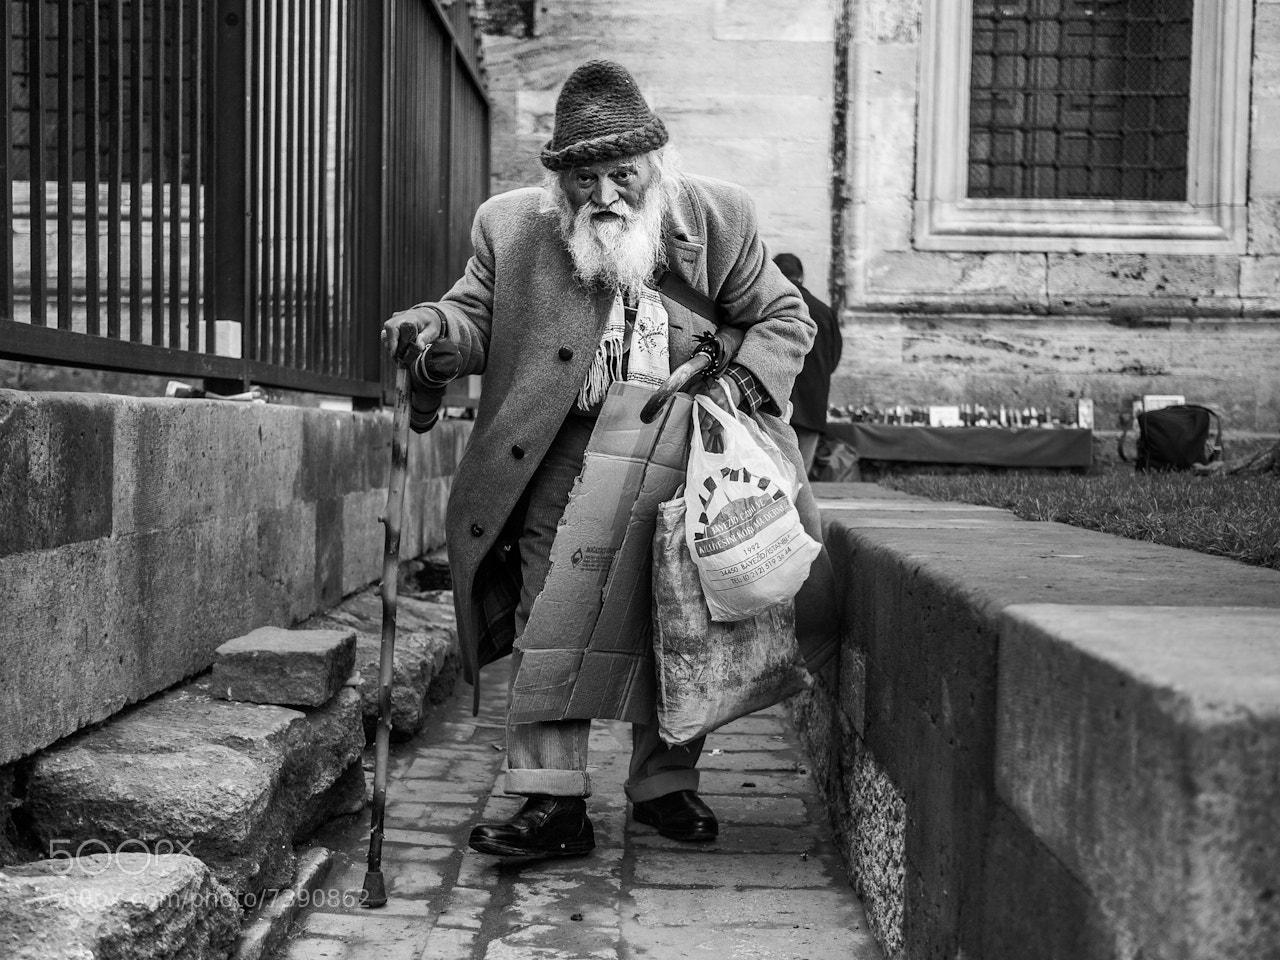 Photograph Walking towards me, Istanbul by Adde Adesokan on 500px